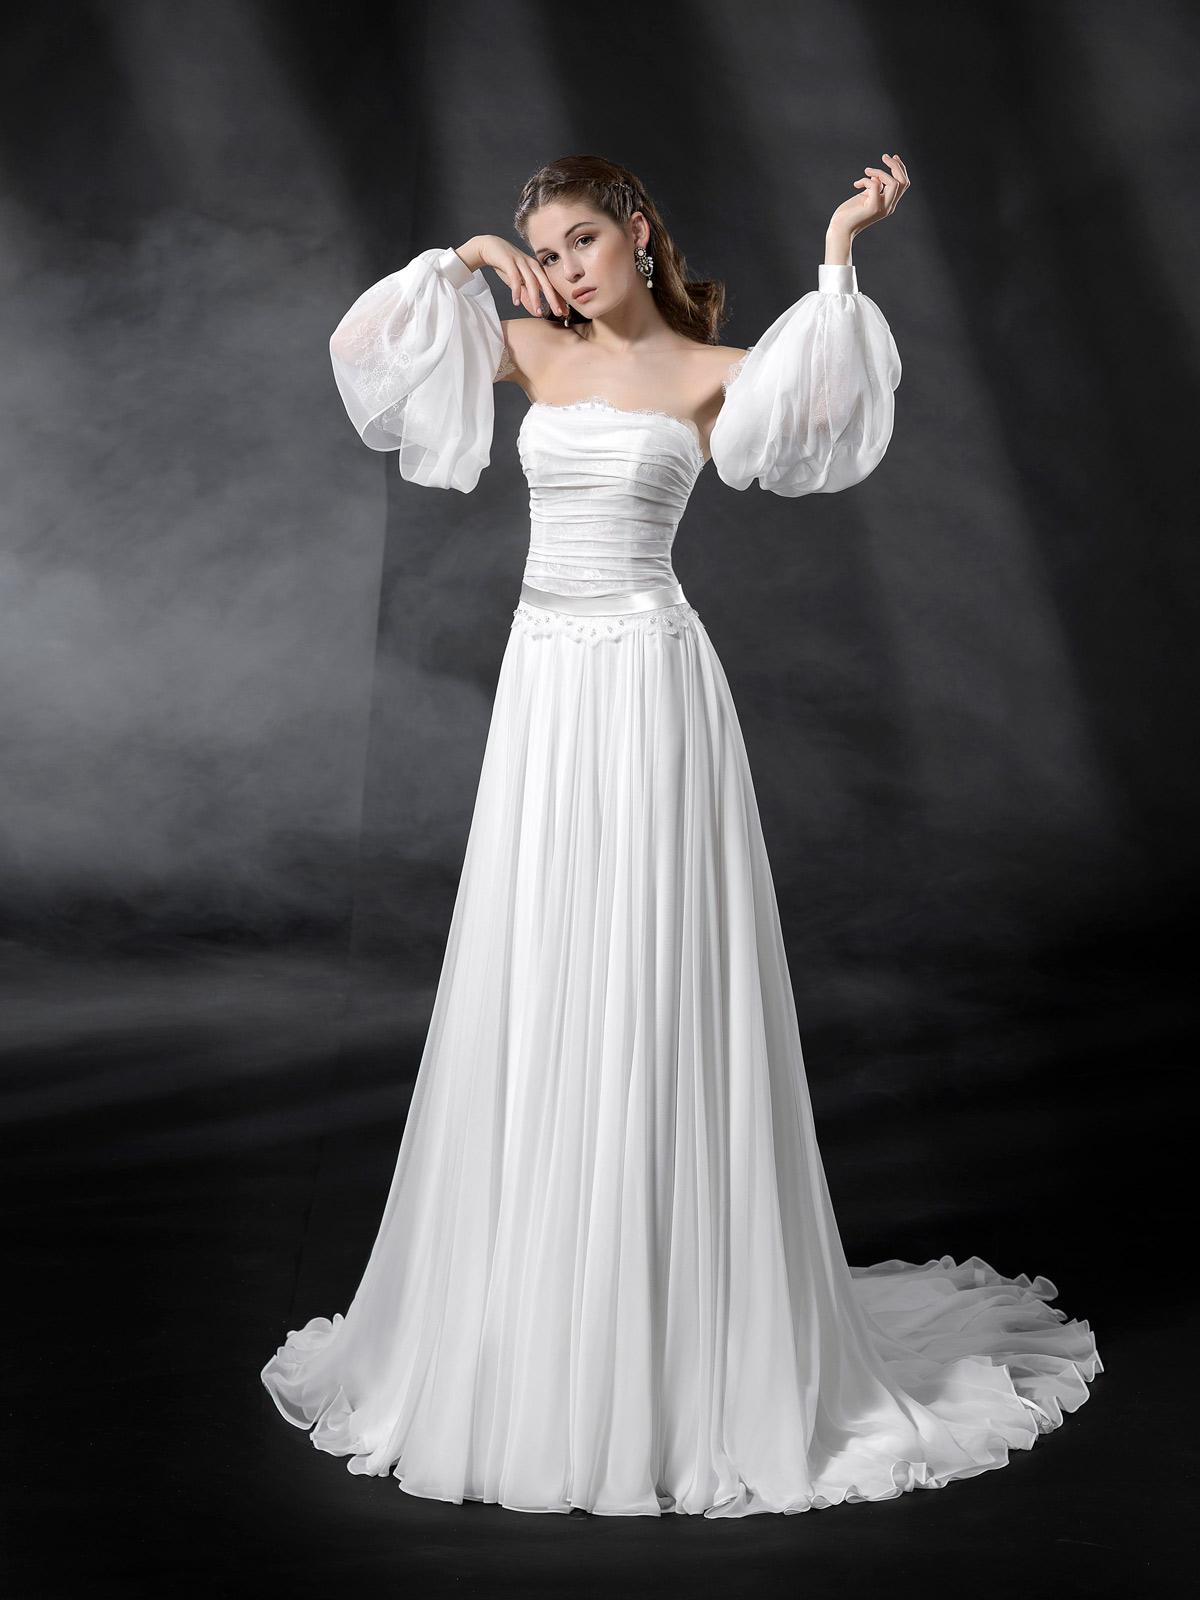 Spose Creazioni Sposa Stefania Parma J109 Da Elena Abito tsBxohQrdC